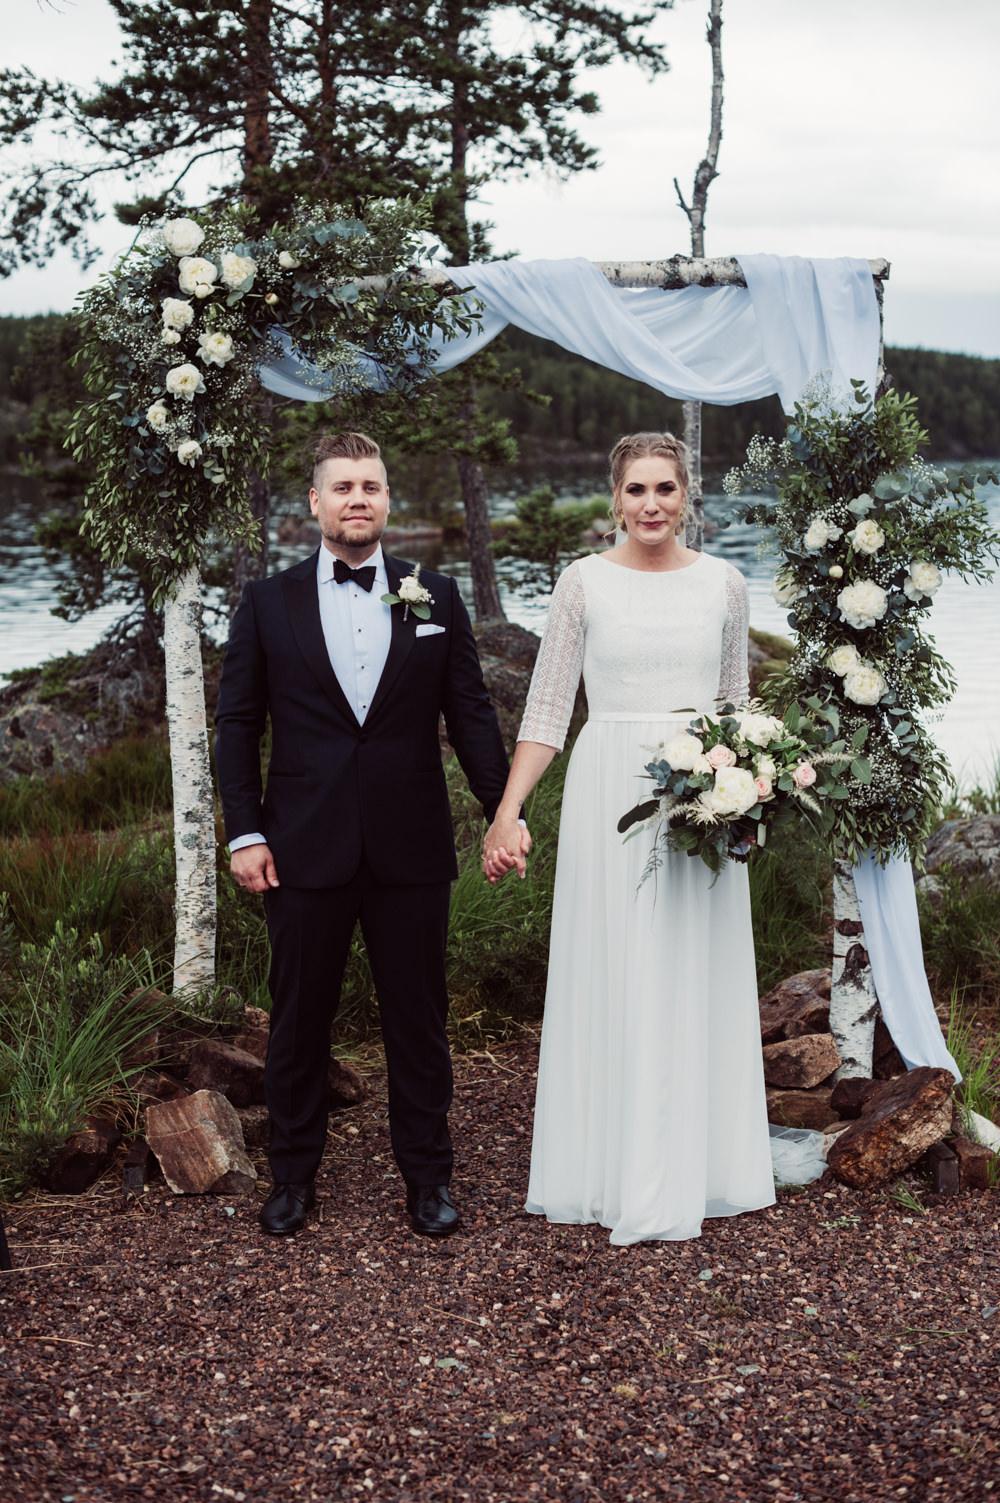 Norway Wedding Maximilian Photography Outdoor Ceremony Backdrop Flower Arch Fabric Greenery Foliage Aisle